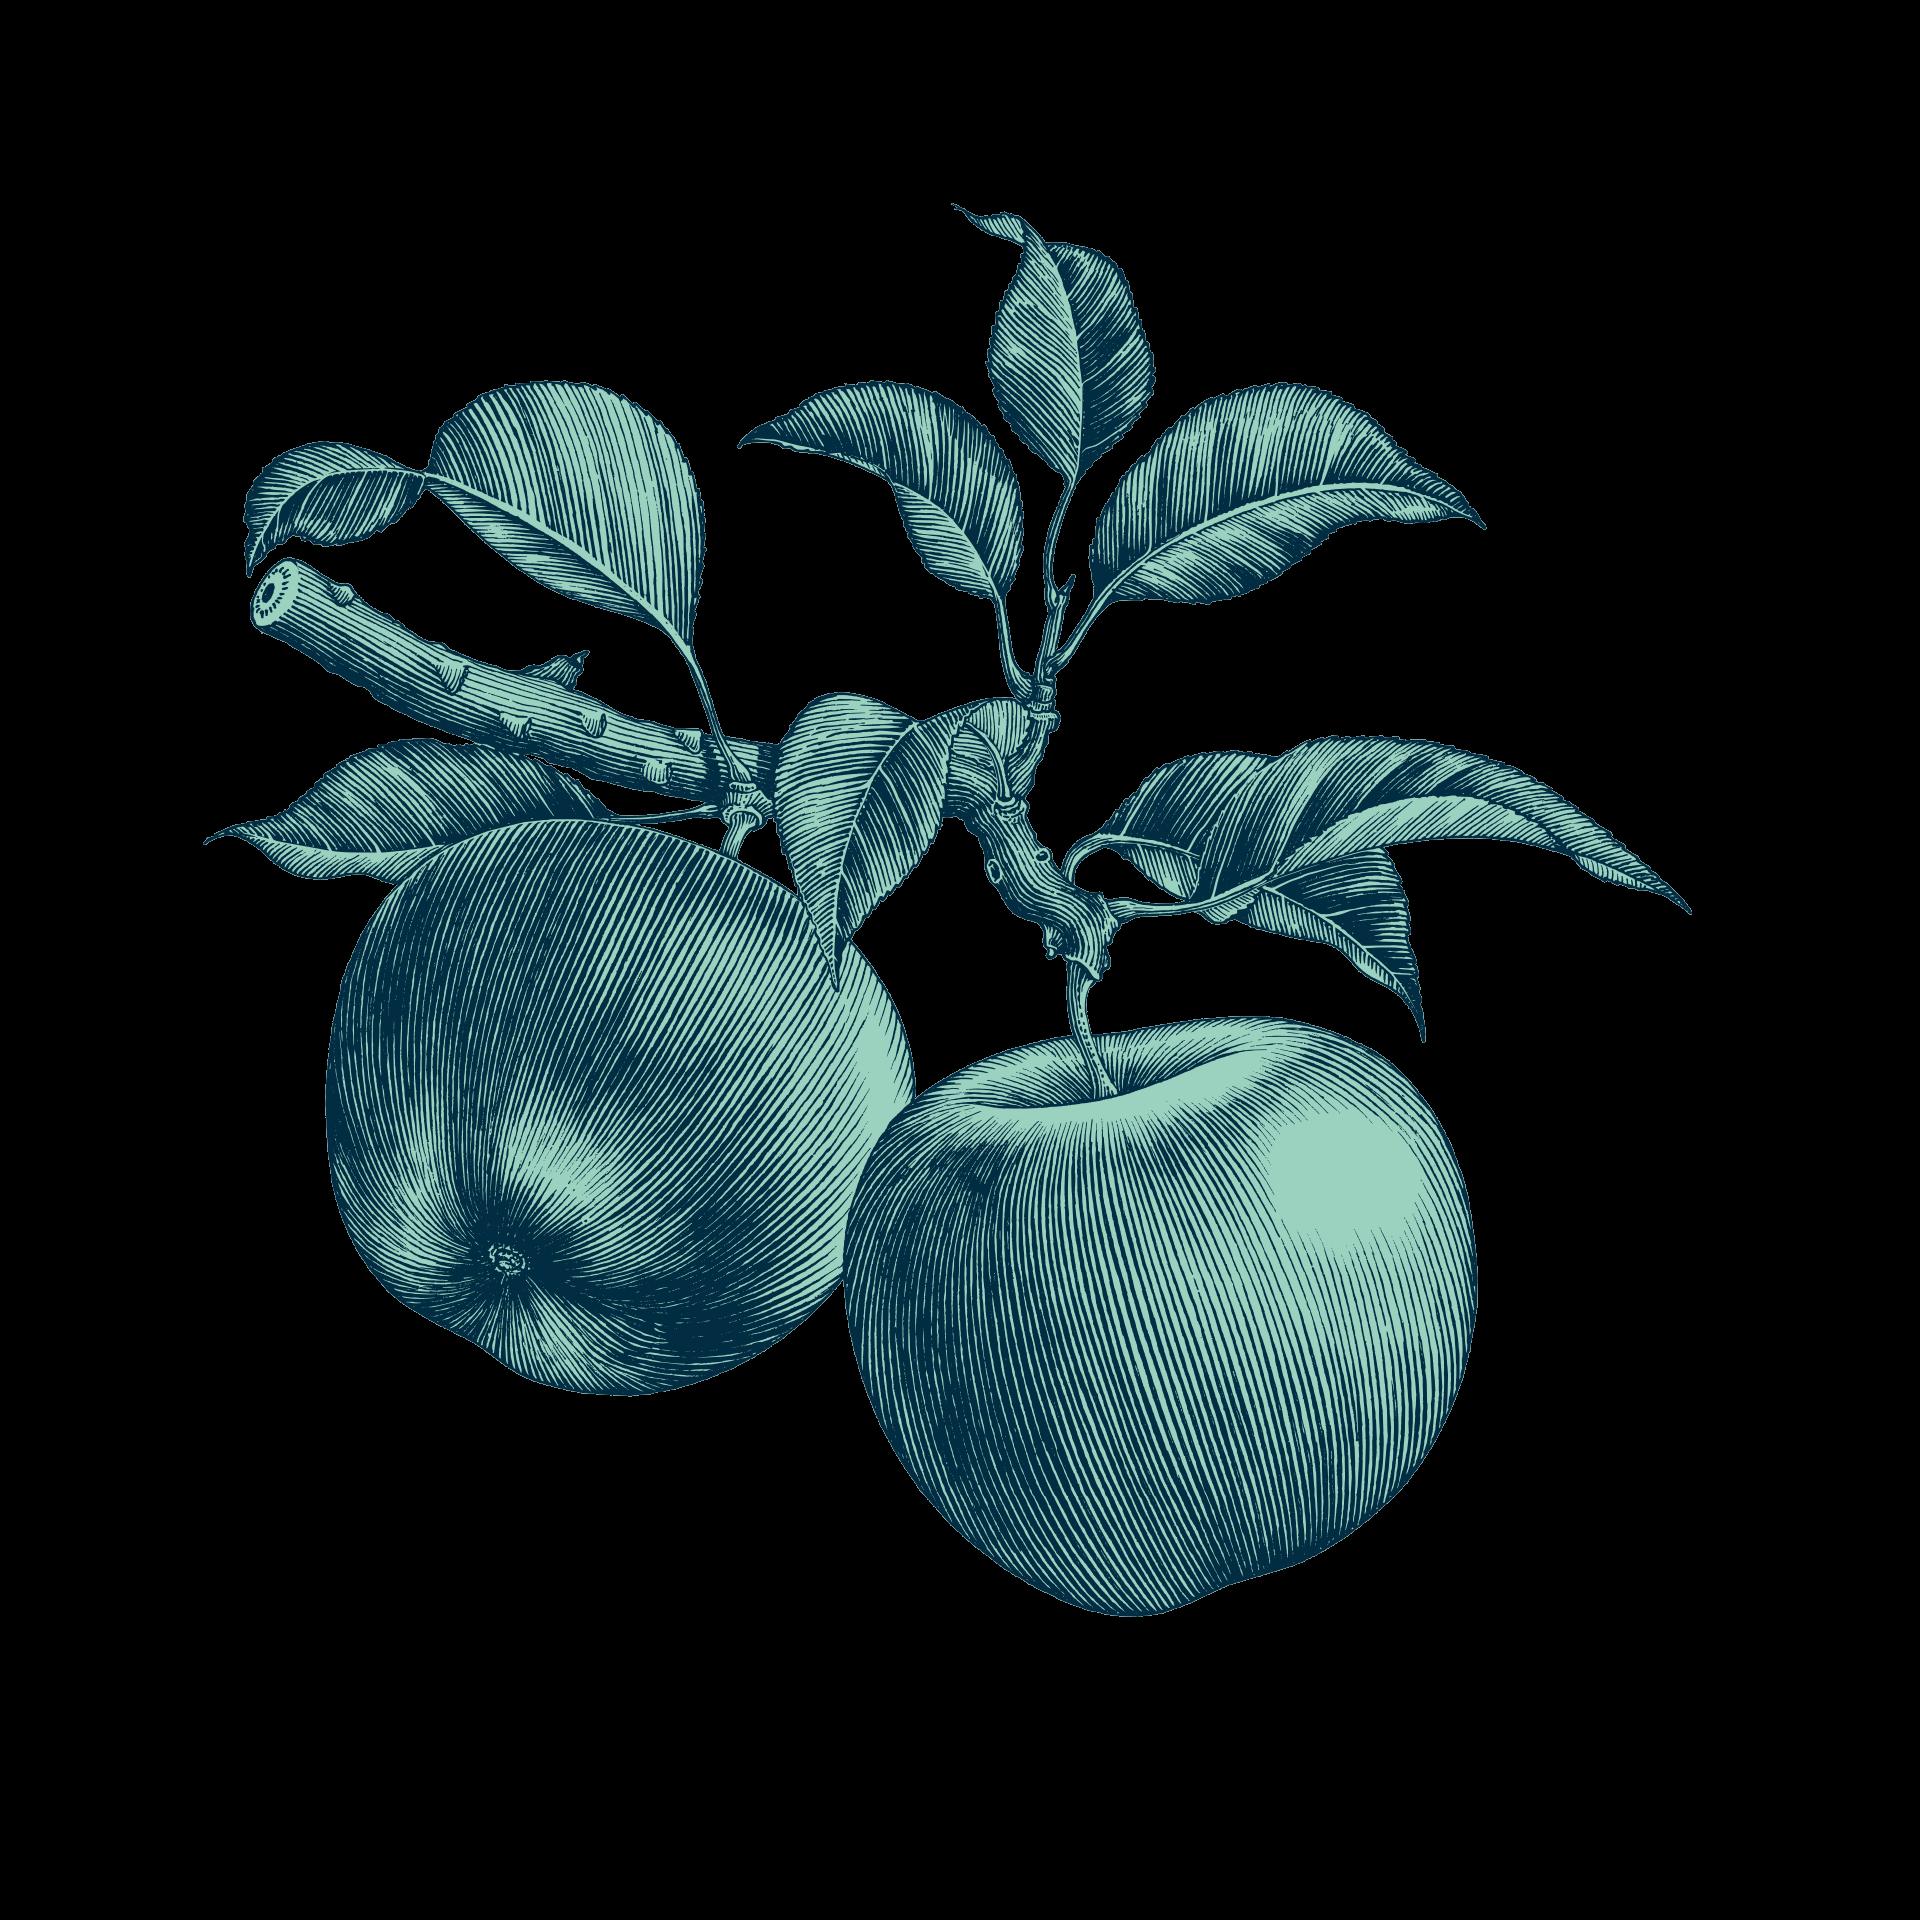 Illustration de pommes